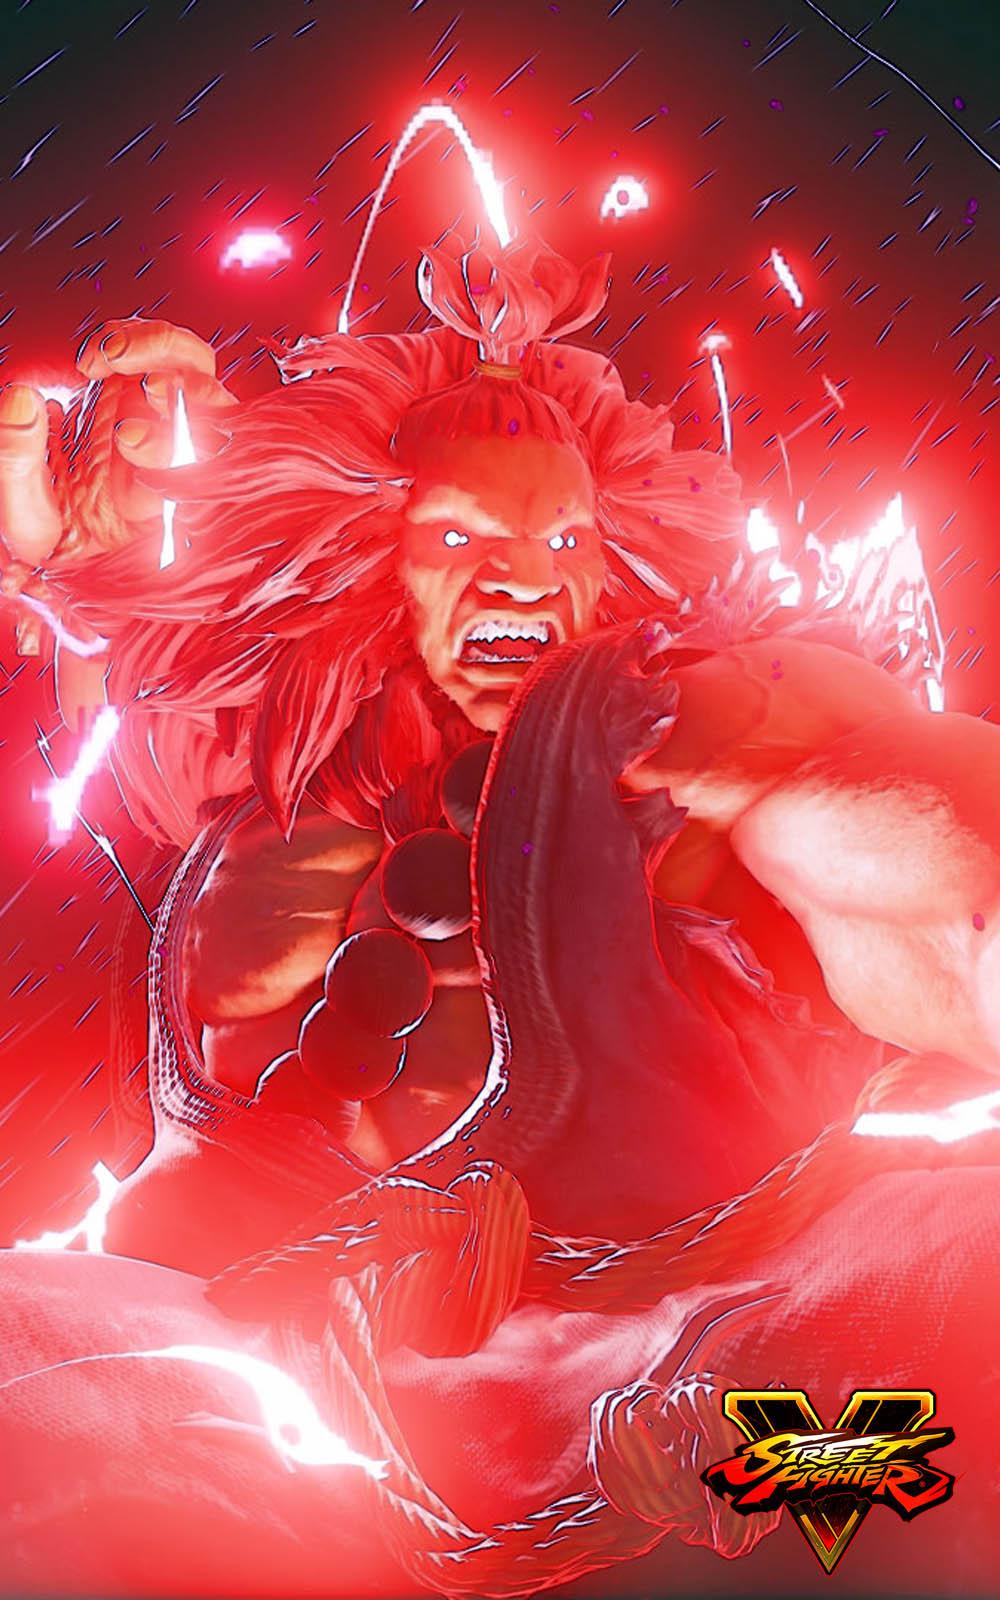 Akuma Street Fighter 5 Hero HD Mobile Wallpaper - Download ...